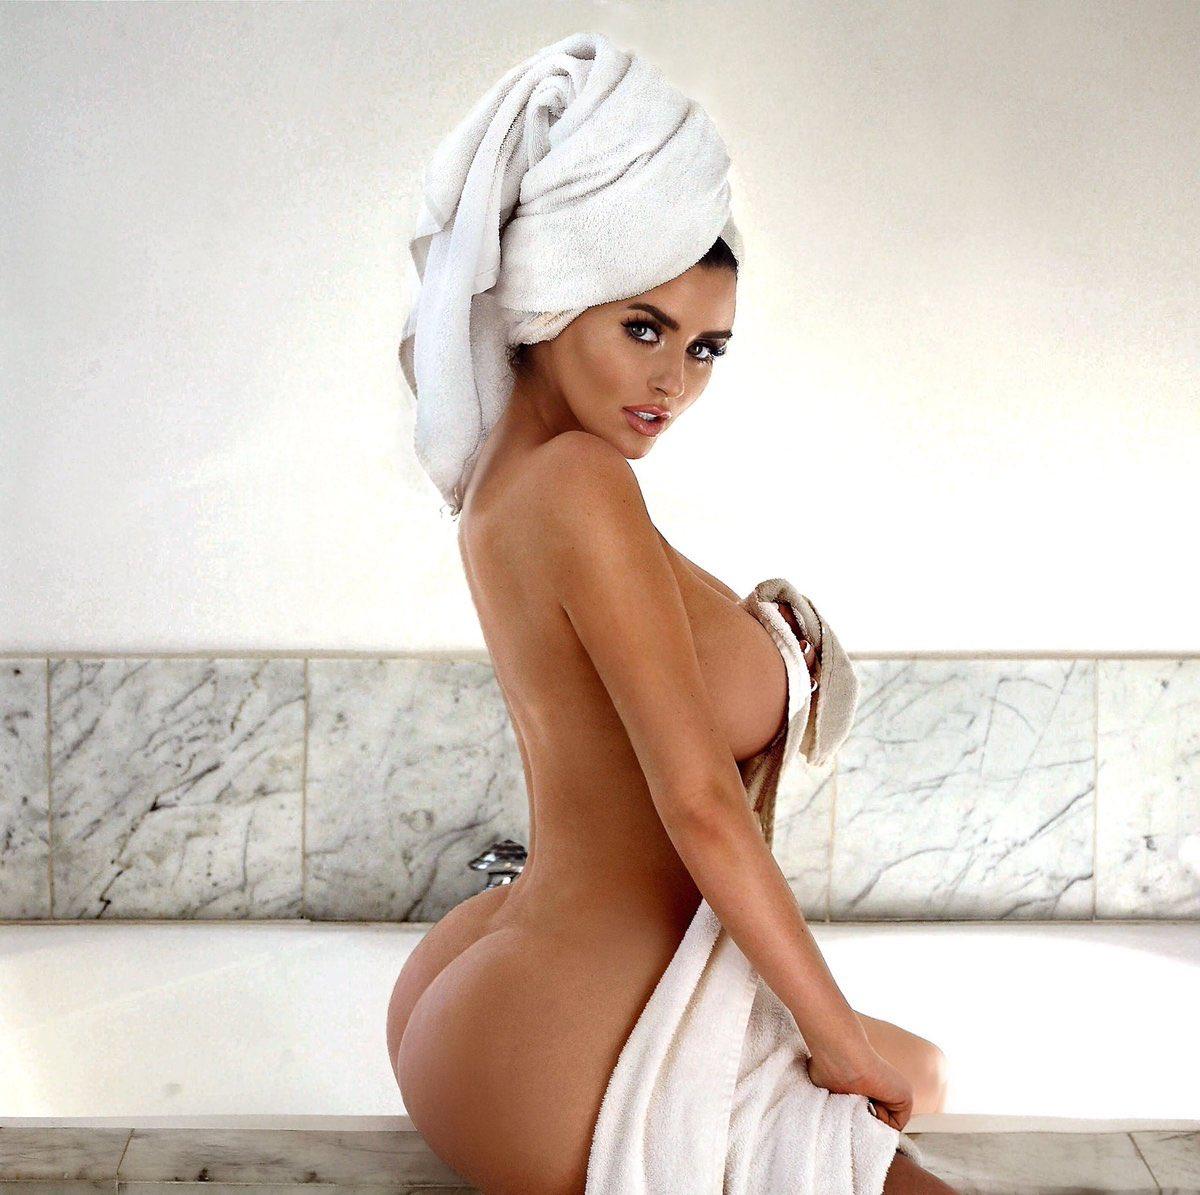 Pix of abigail blok nude